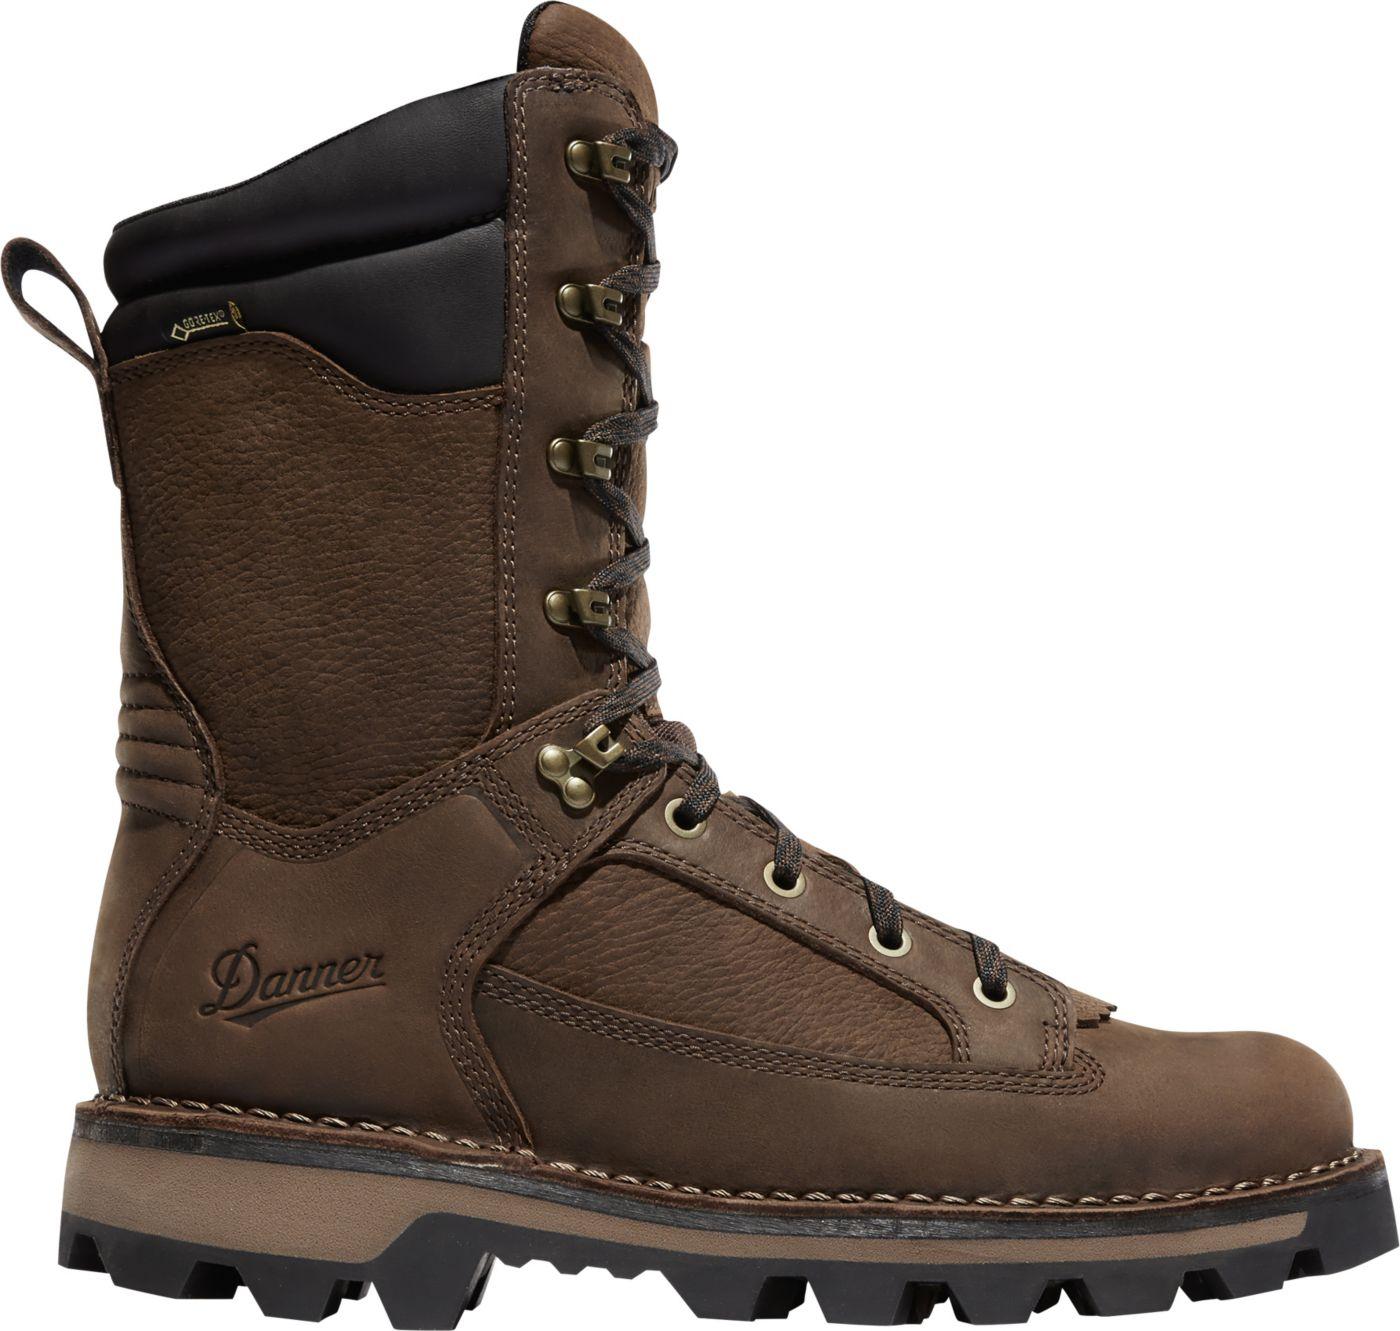 Danner Men's Powderhorn 10'' GORE-TEX Hunting Boots